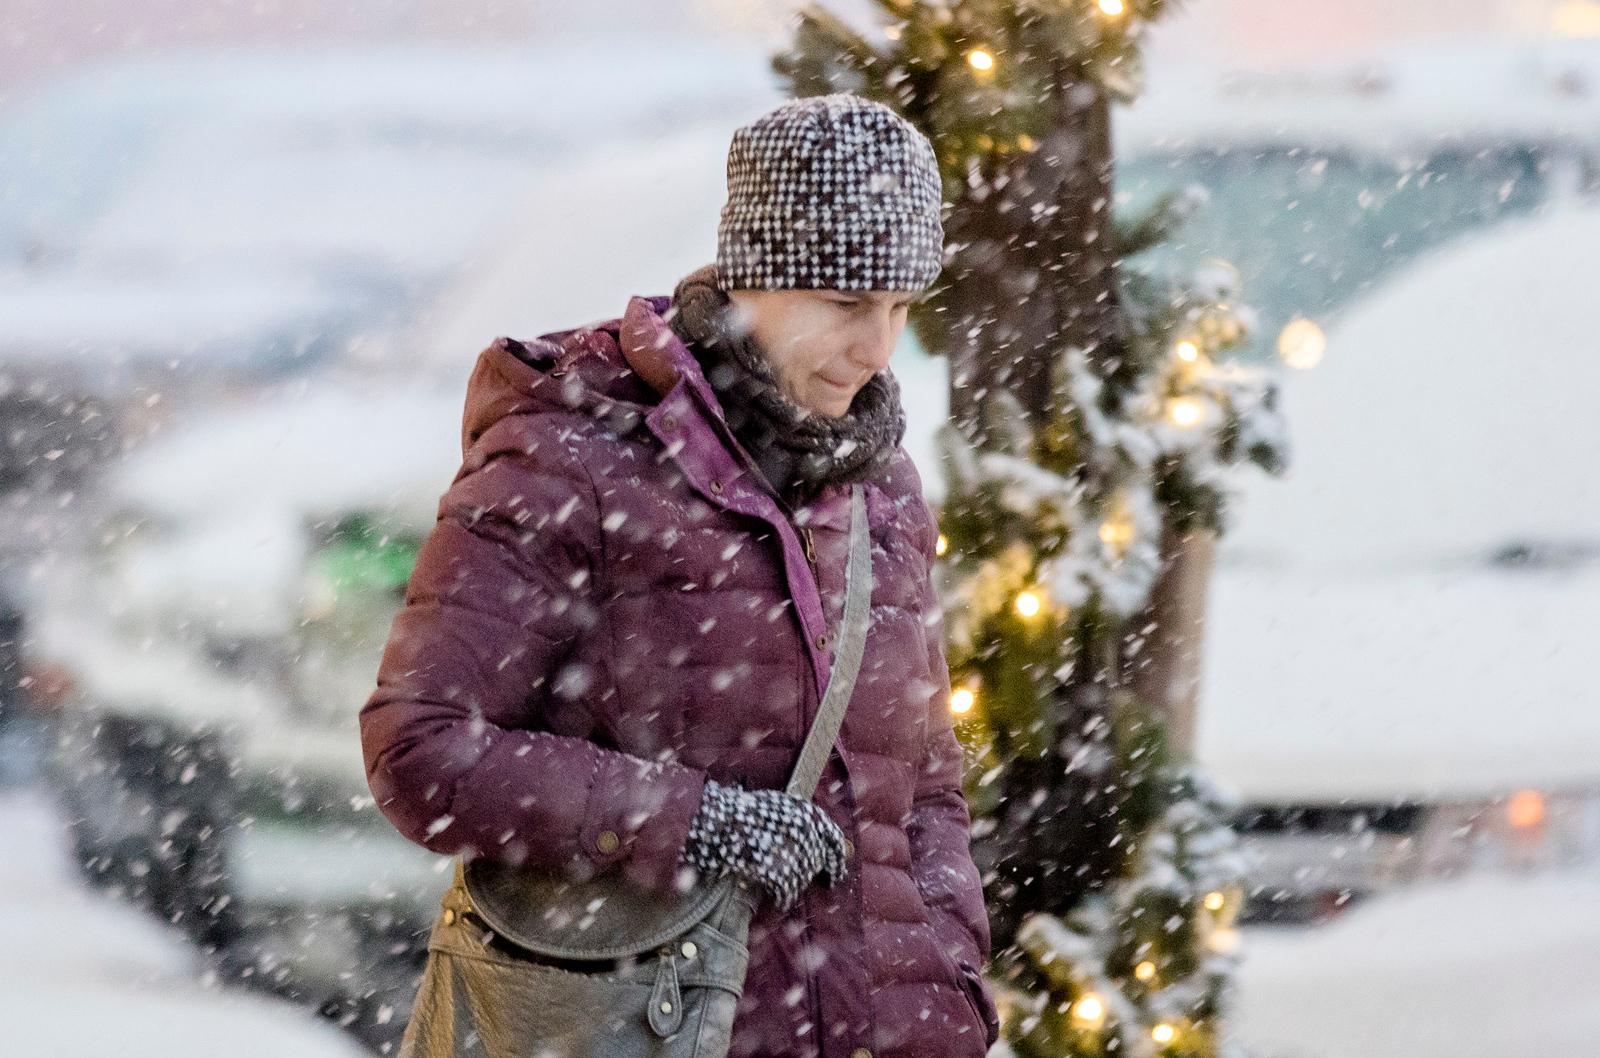 hnews_tue1212_Snow_Weather_02.jpg